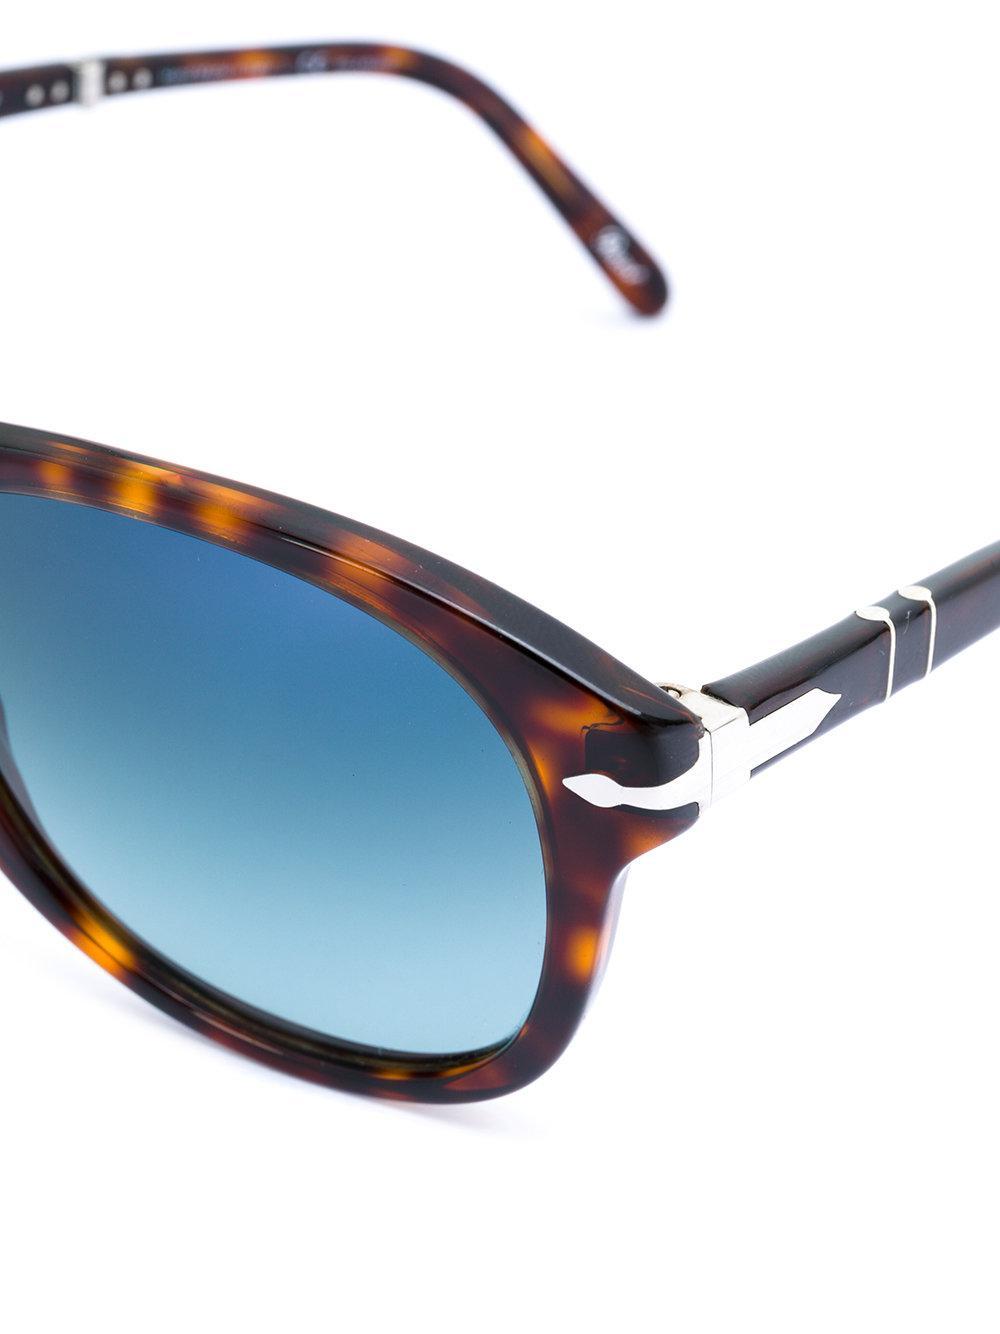 Persol Foldable Steve Mcqueen Sunglasses in Brown